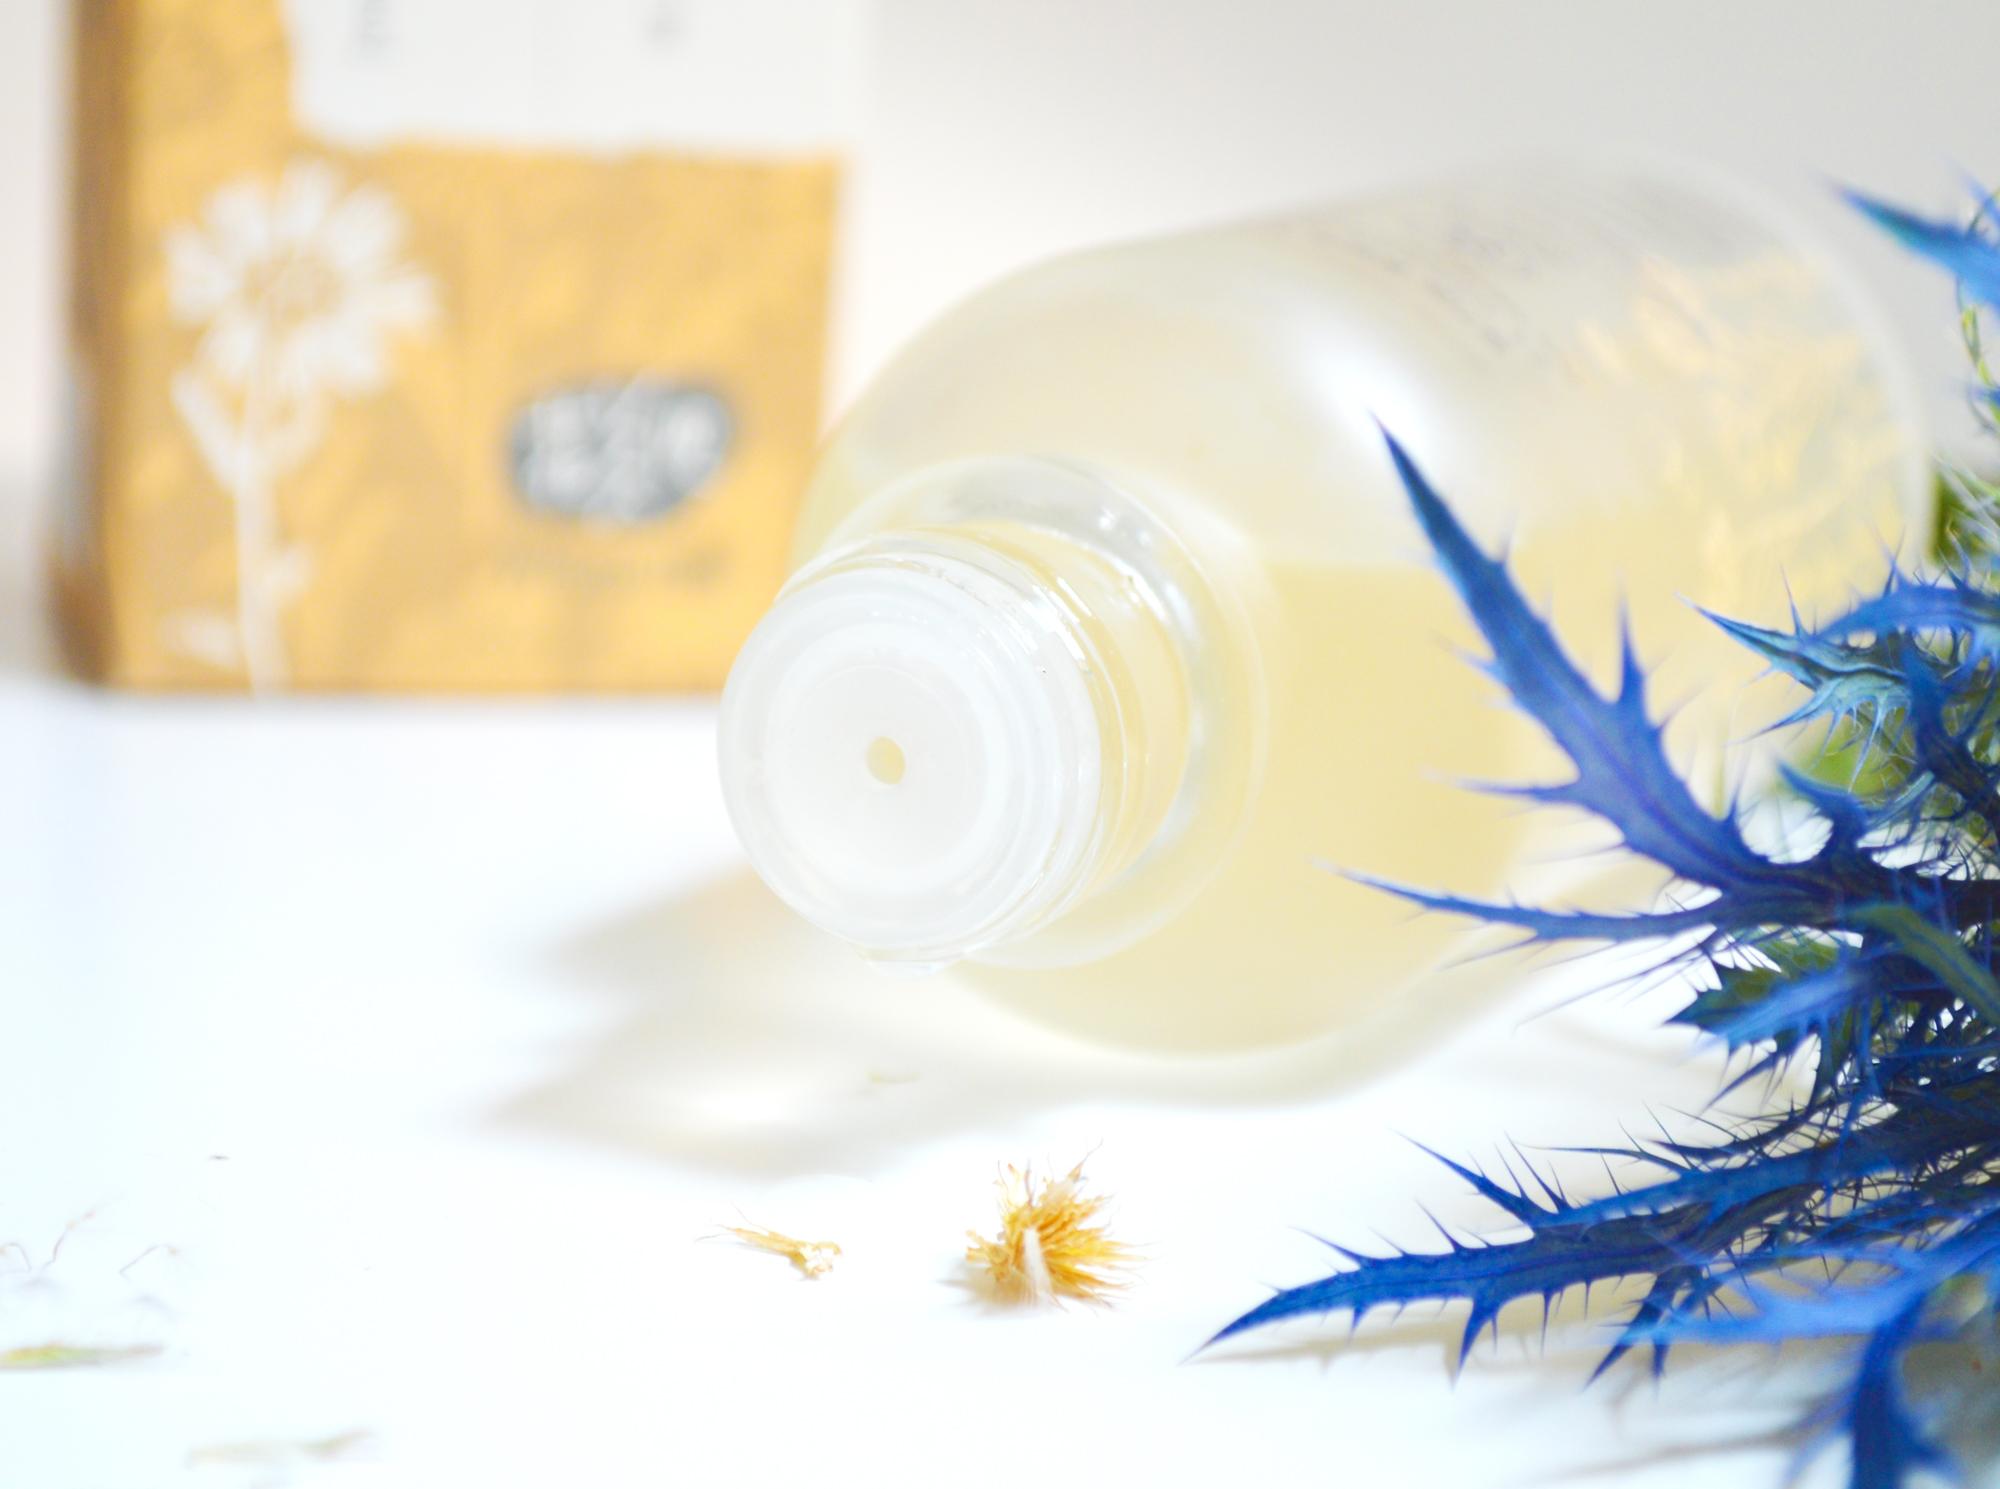 Tonique coréen bio Whamisa Organic Flowers Toner Original : mon avis